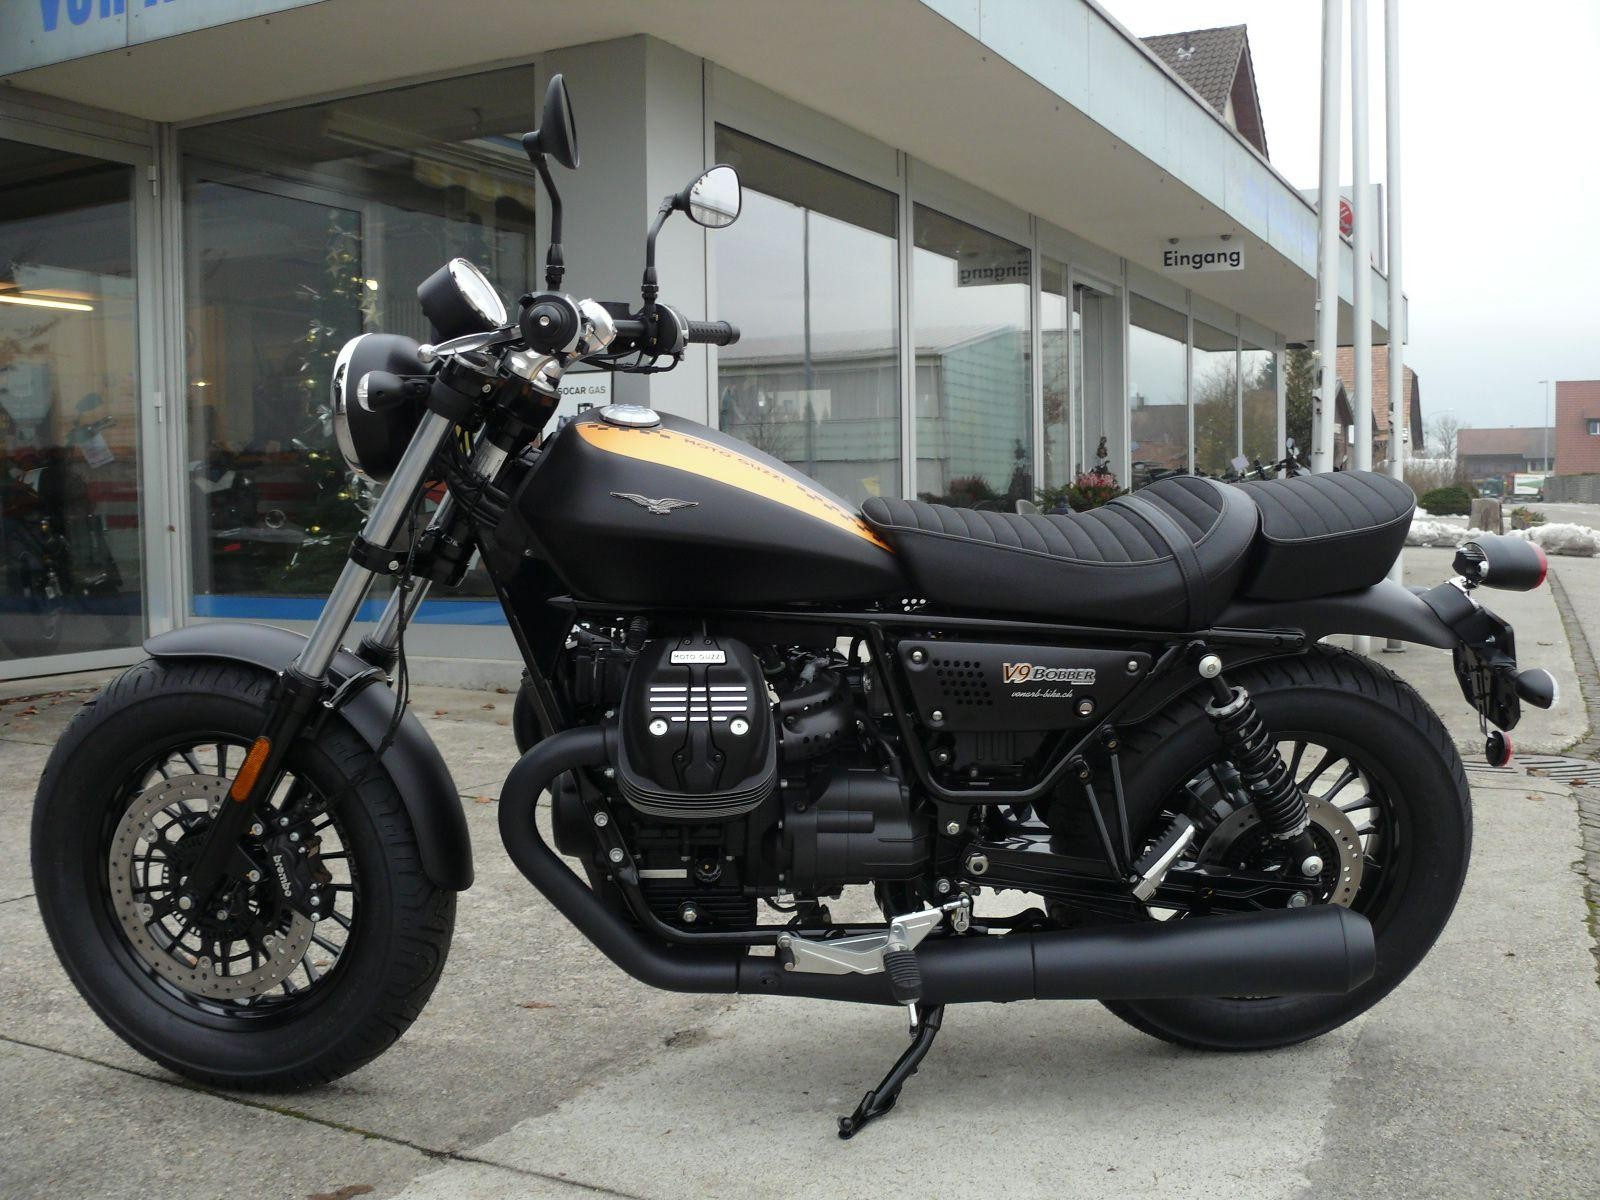 moto neuve acheter moto guzzi v9 bobber abs leasing ab von arb bike ag neuendorf. Black Bedroom Furniture Sets. Home Design Ideas